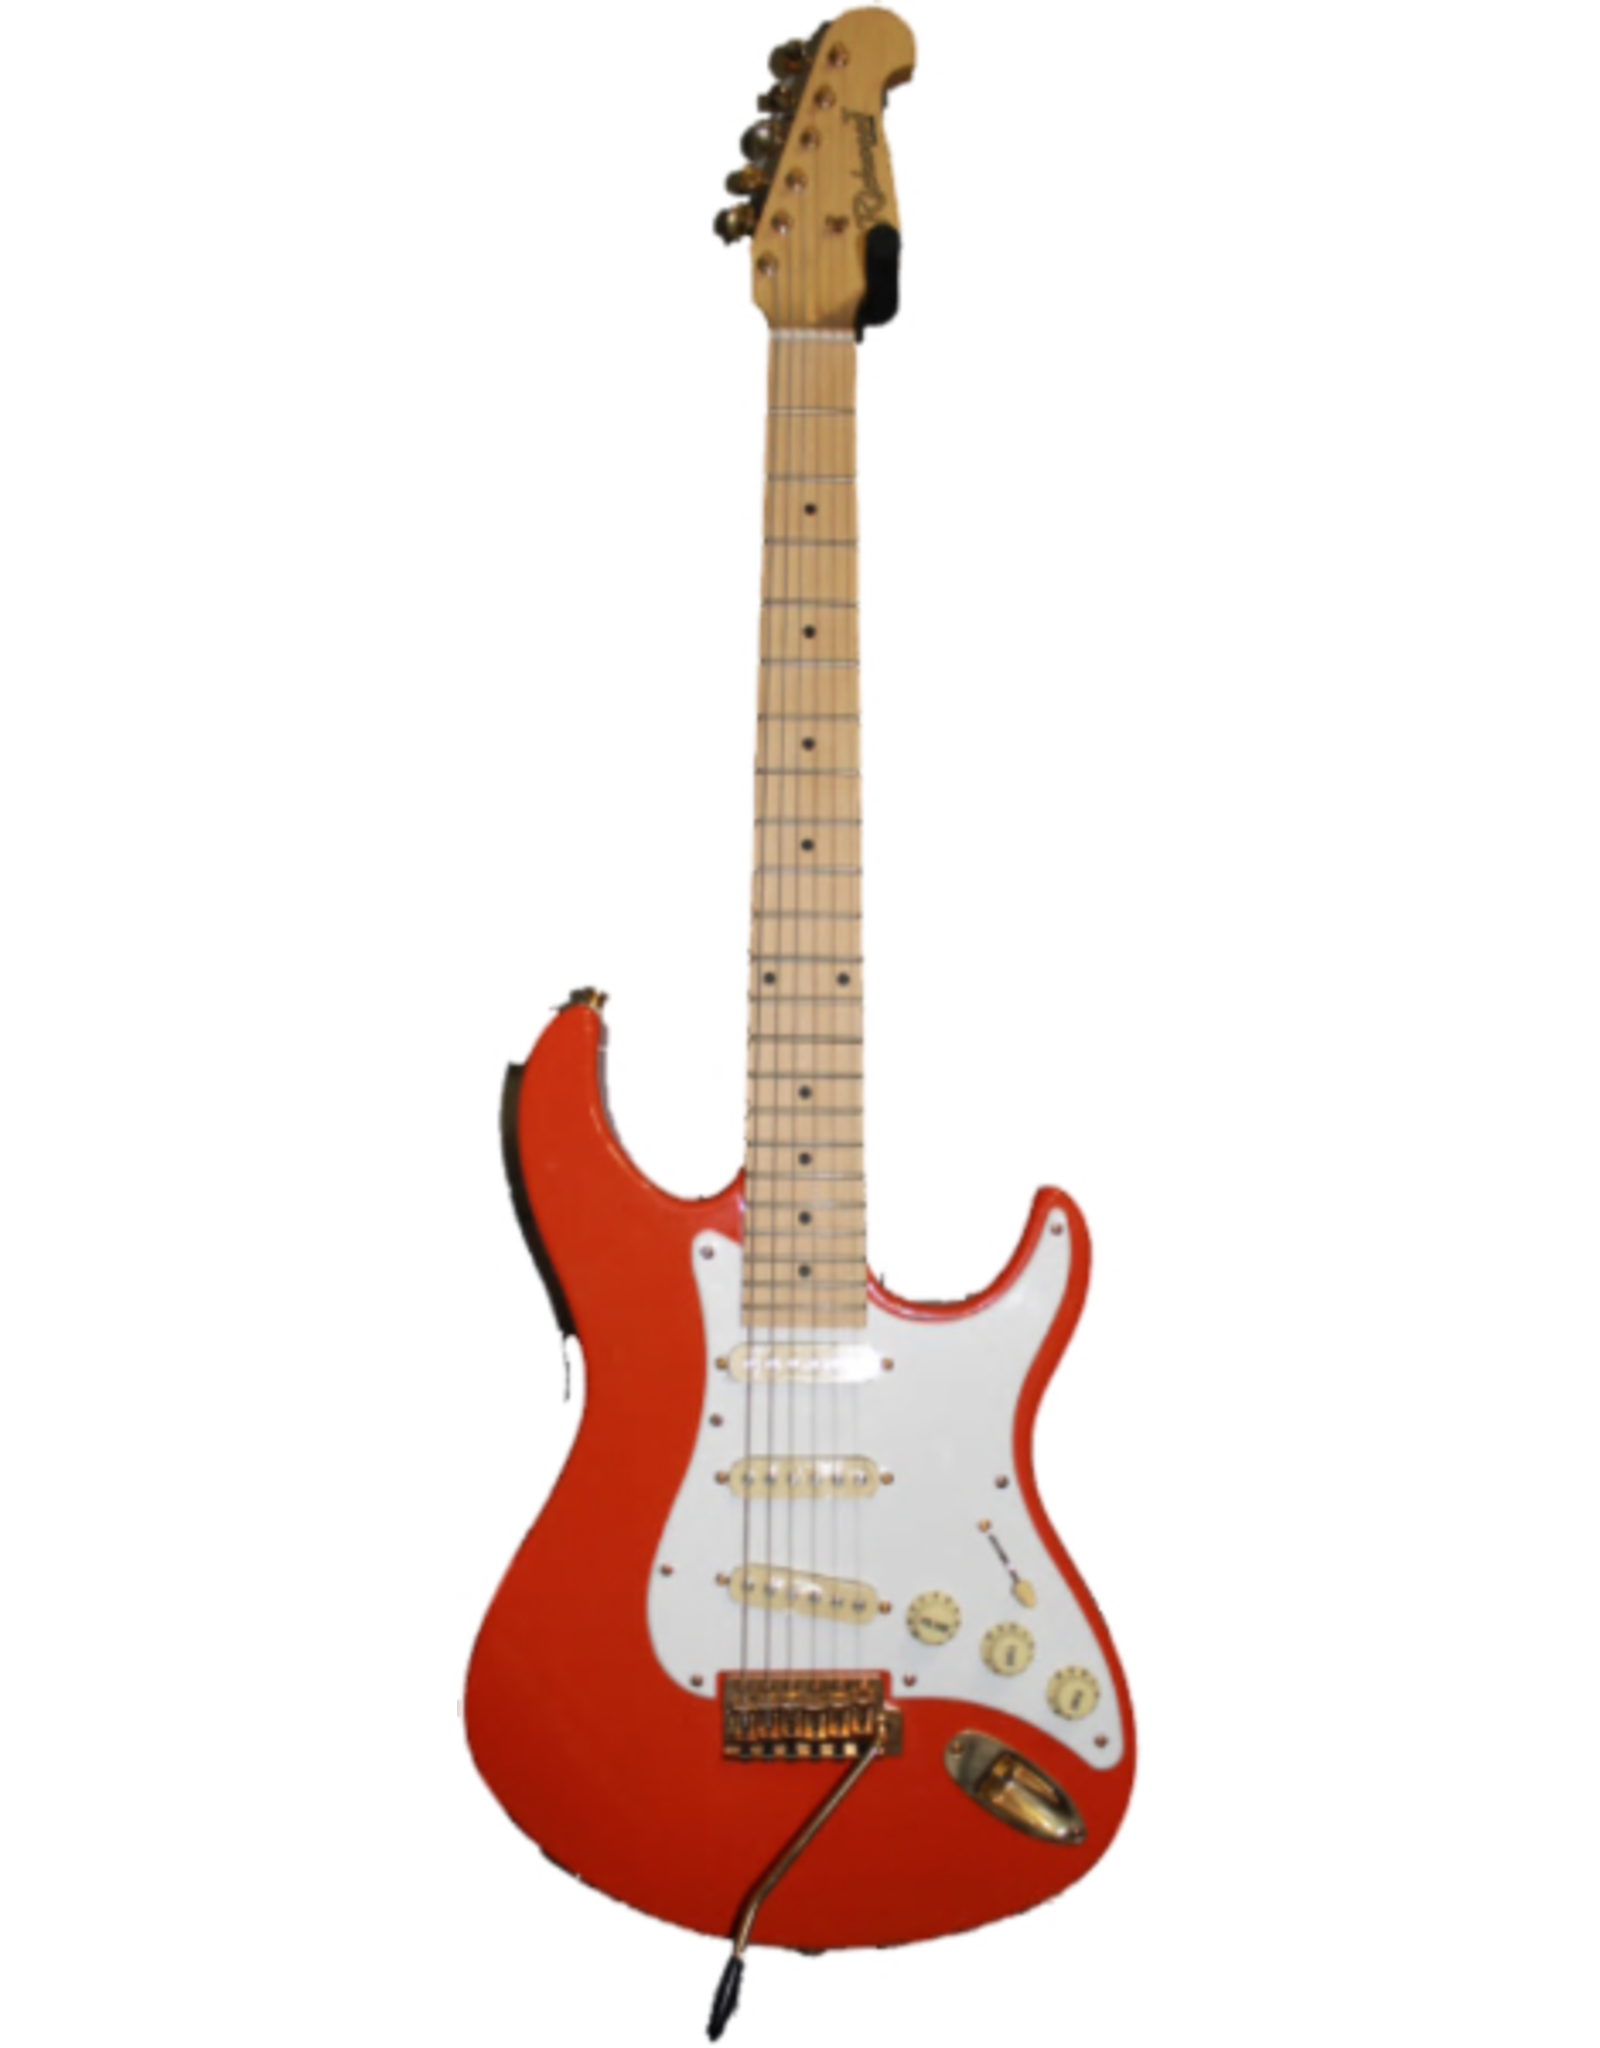 Richwood  REG-157-FR Richwood elektrische gitaar